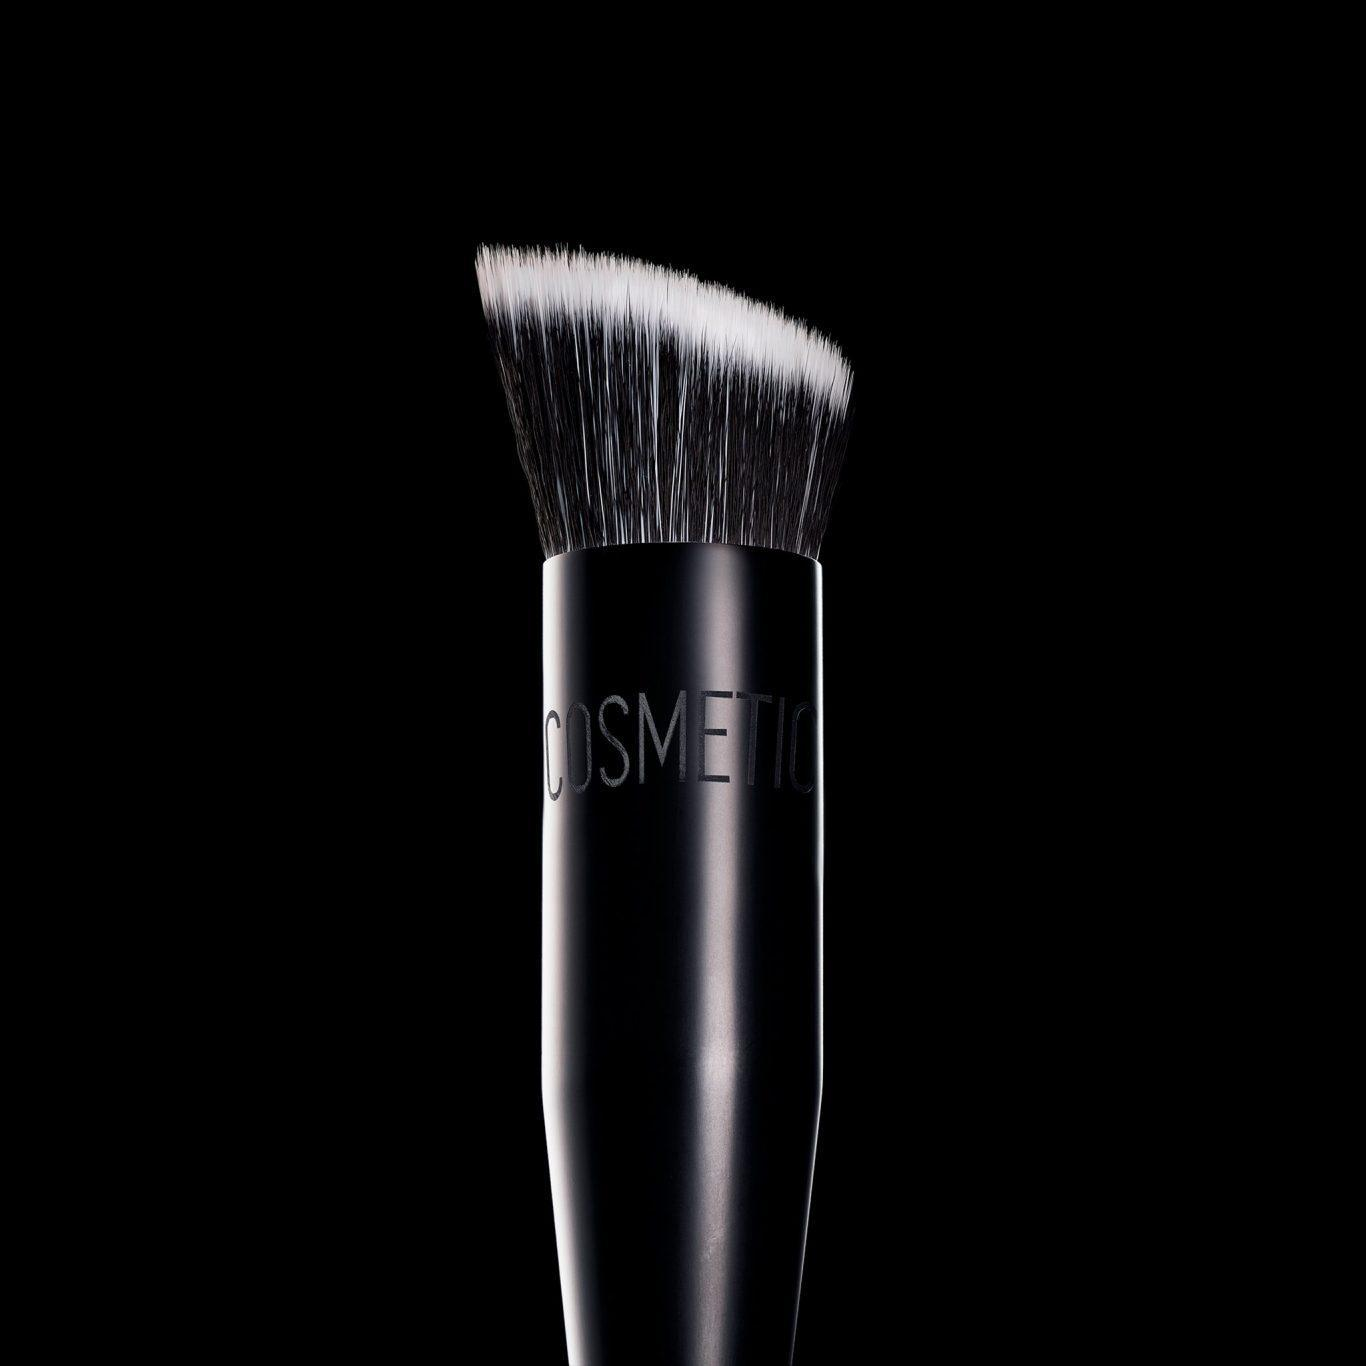 Melt Cosmetics SexFoil Digital Liquid Highlights 777 Face Brush Promo